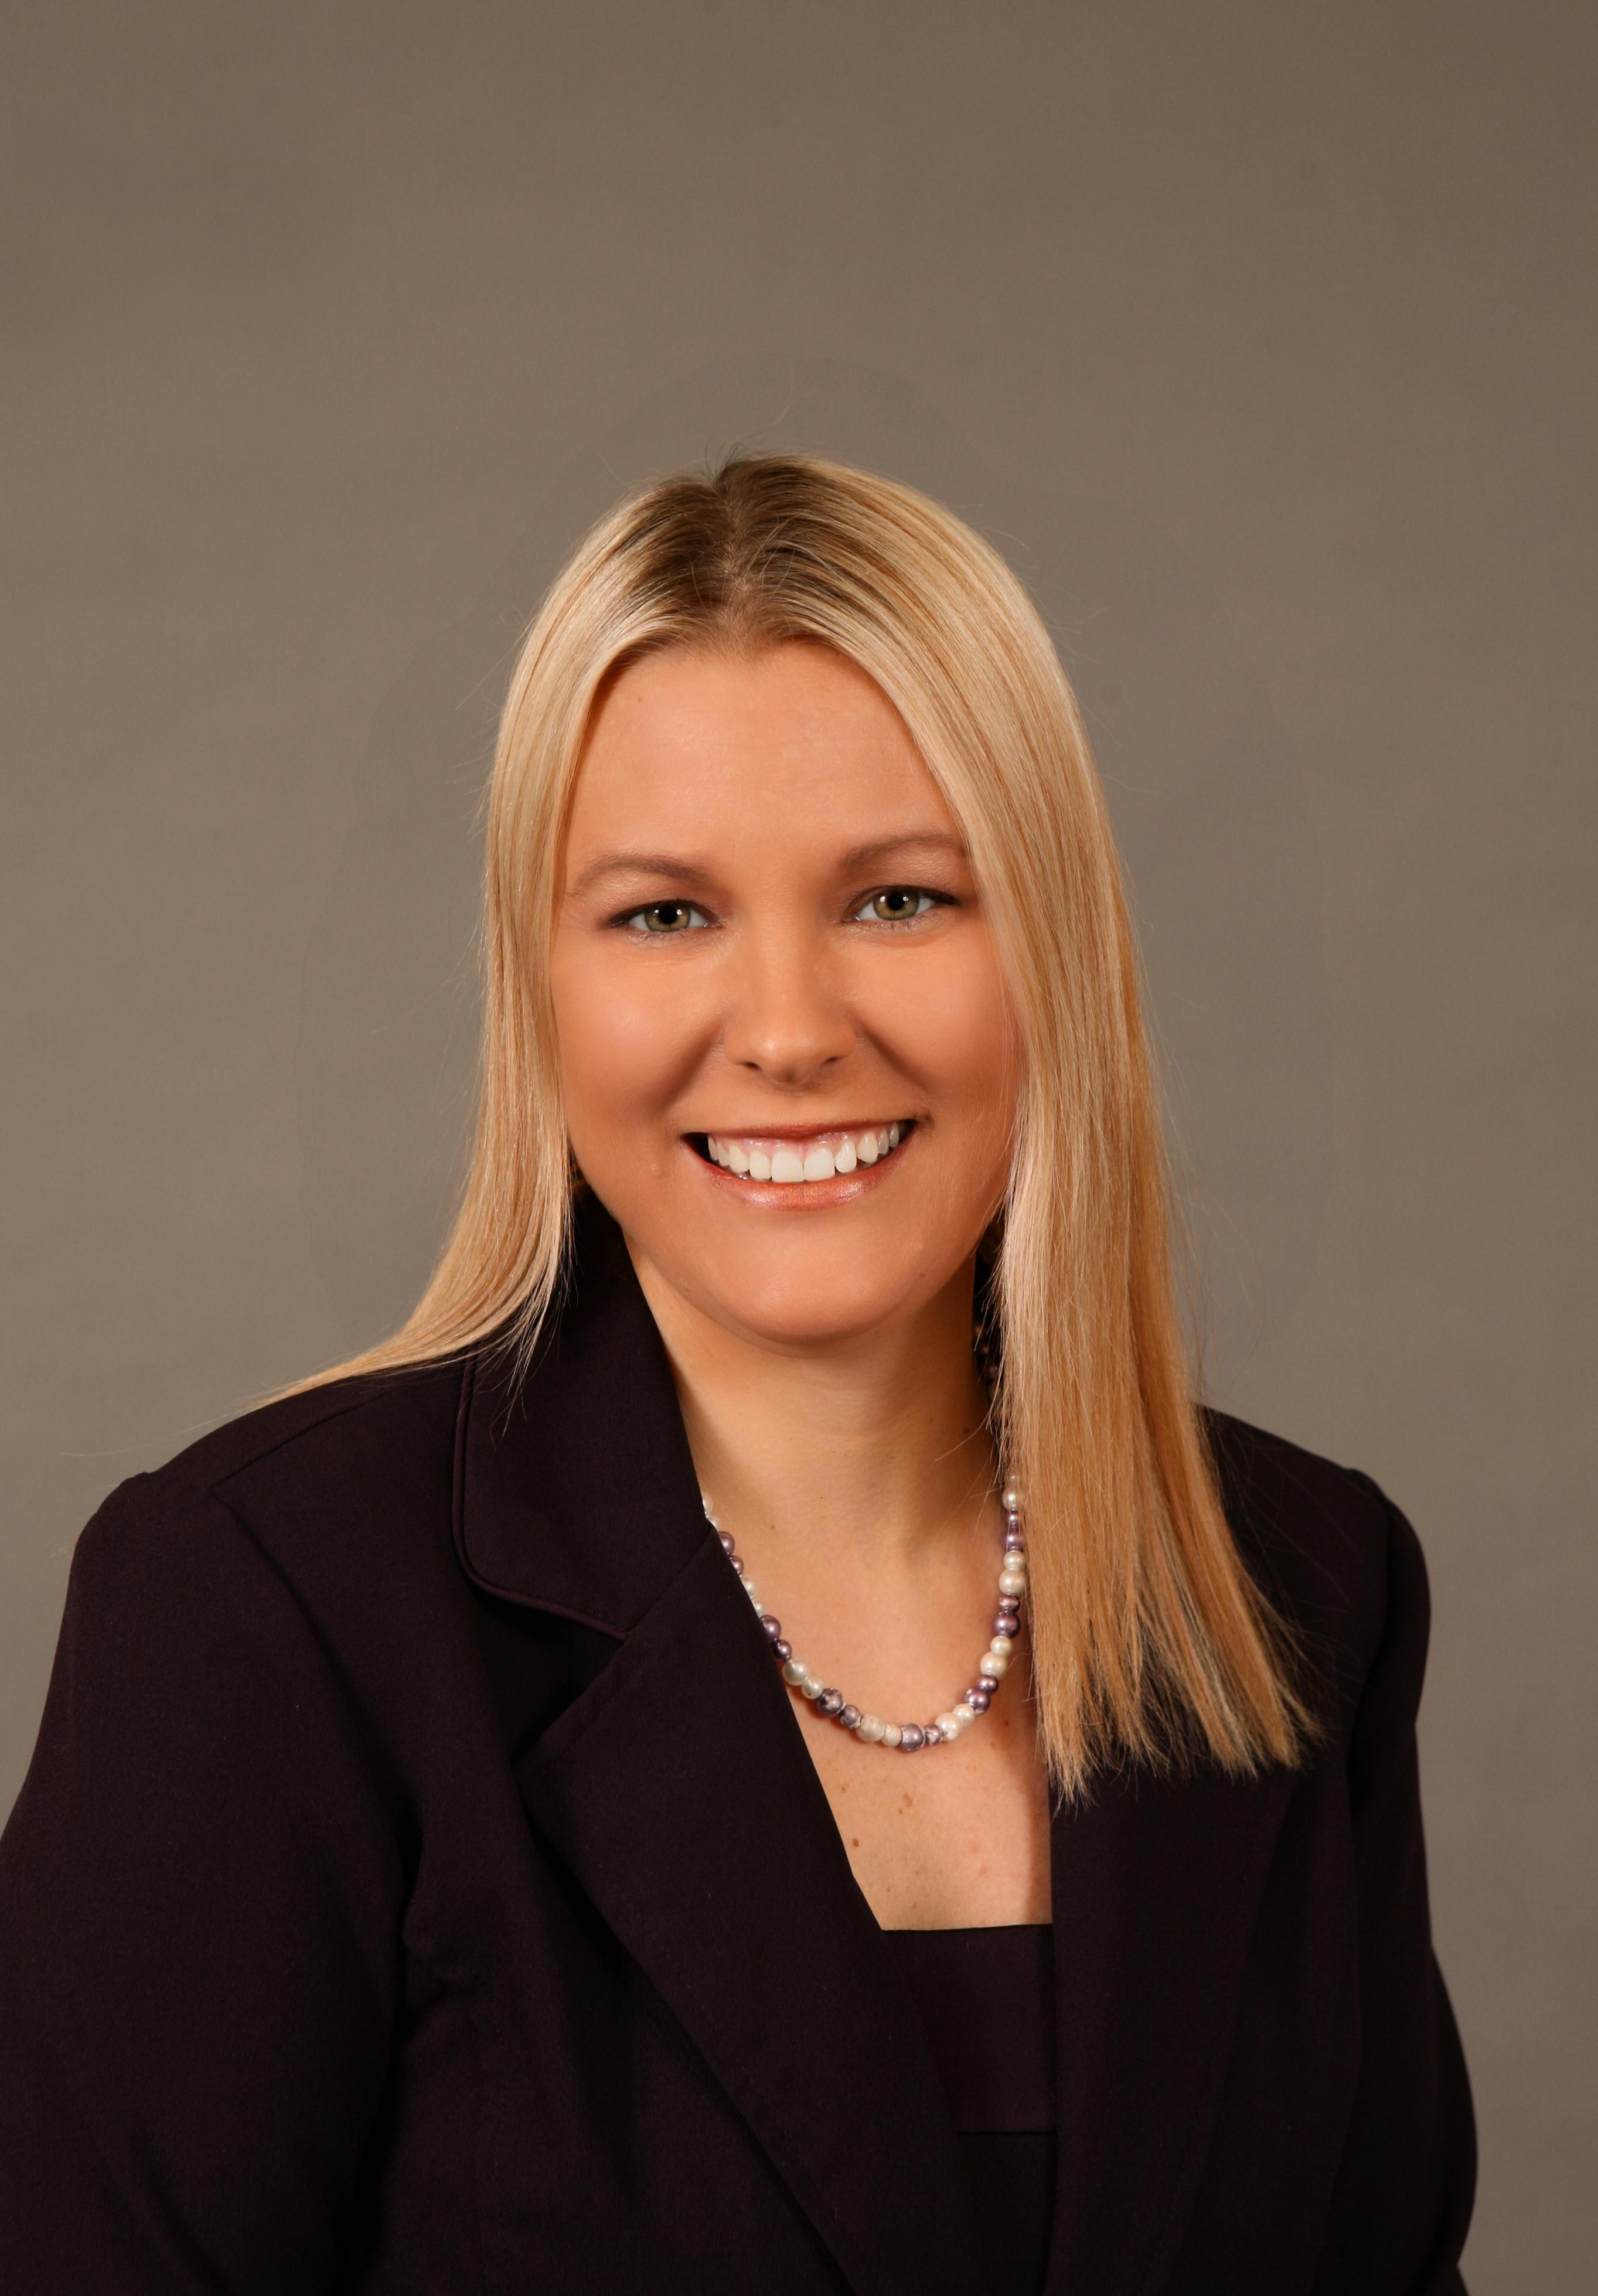 Employee Spotlight: Patient Services Representative